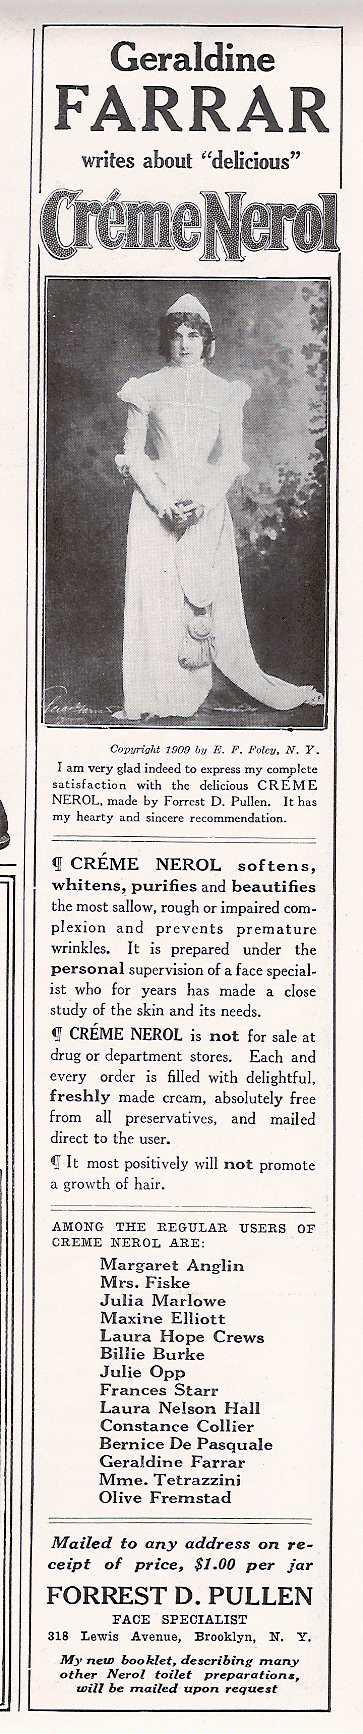 farrar-creme-nerol-1900s-2x11-25in.jpg